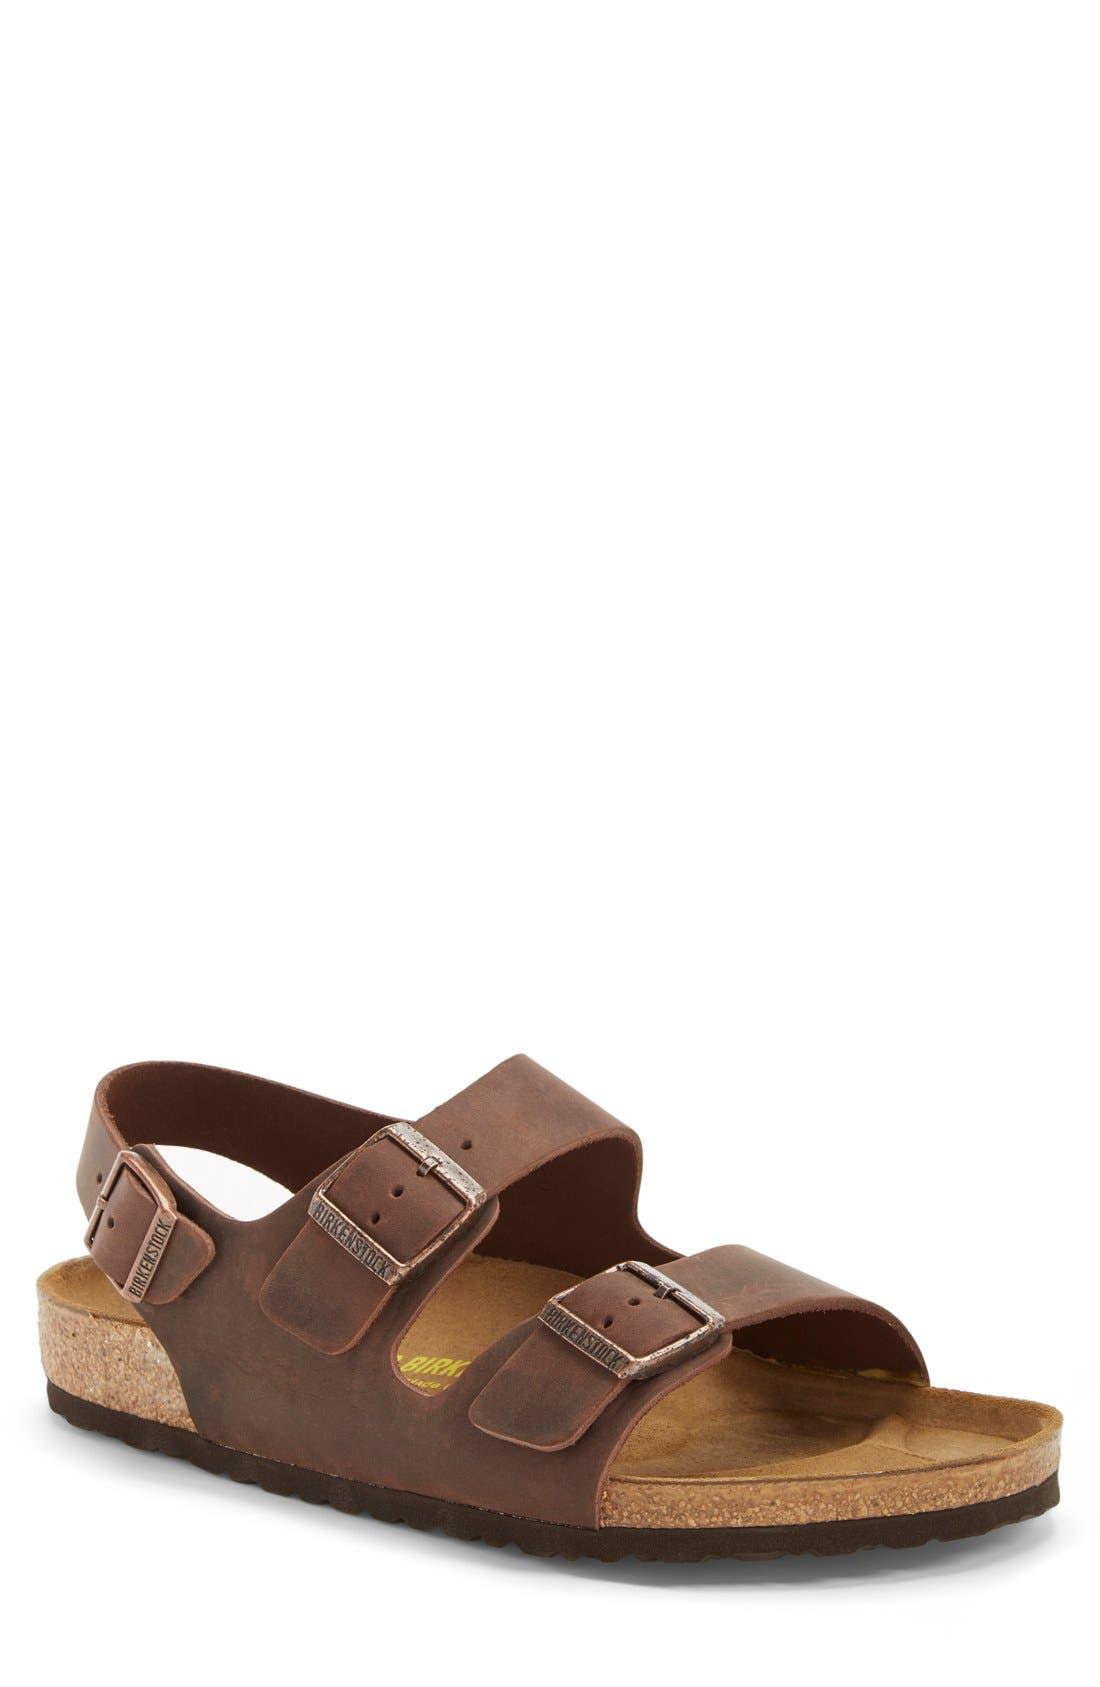 'Milano' Sandal,                             Main thumbnail 1, color,                             HABANA OILED